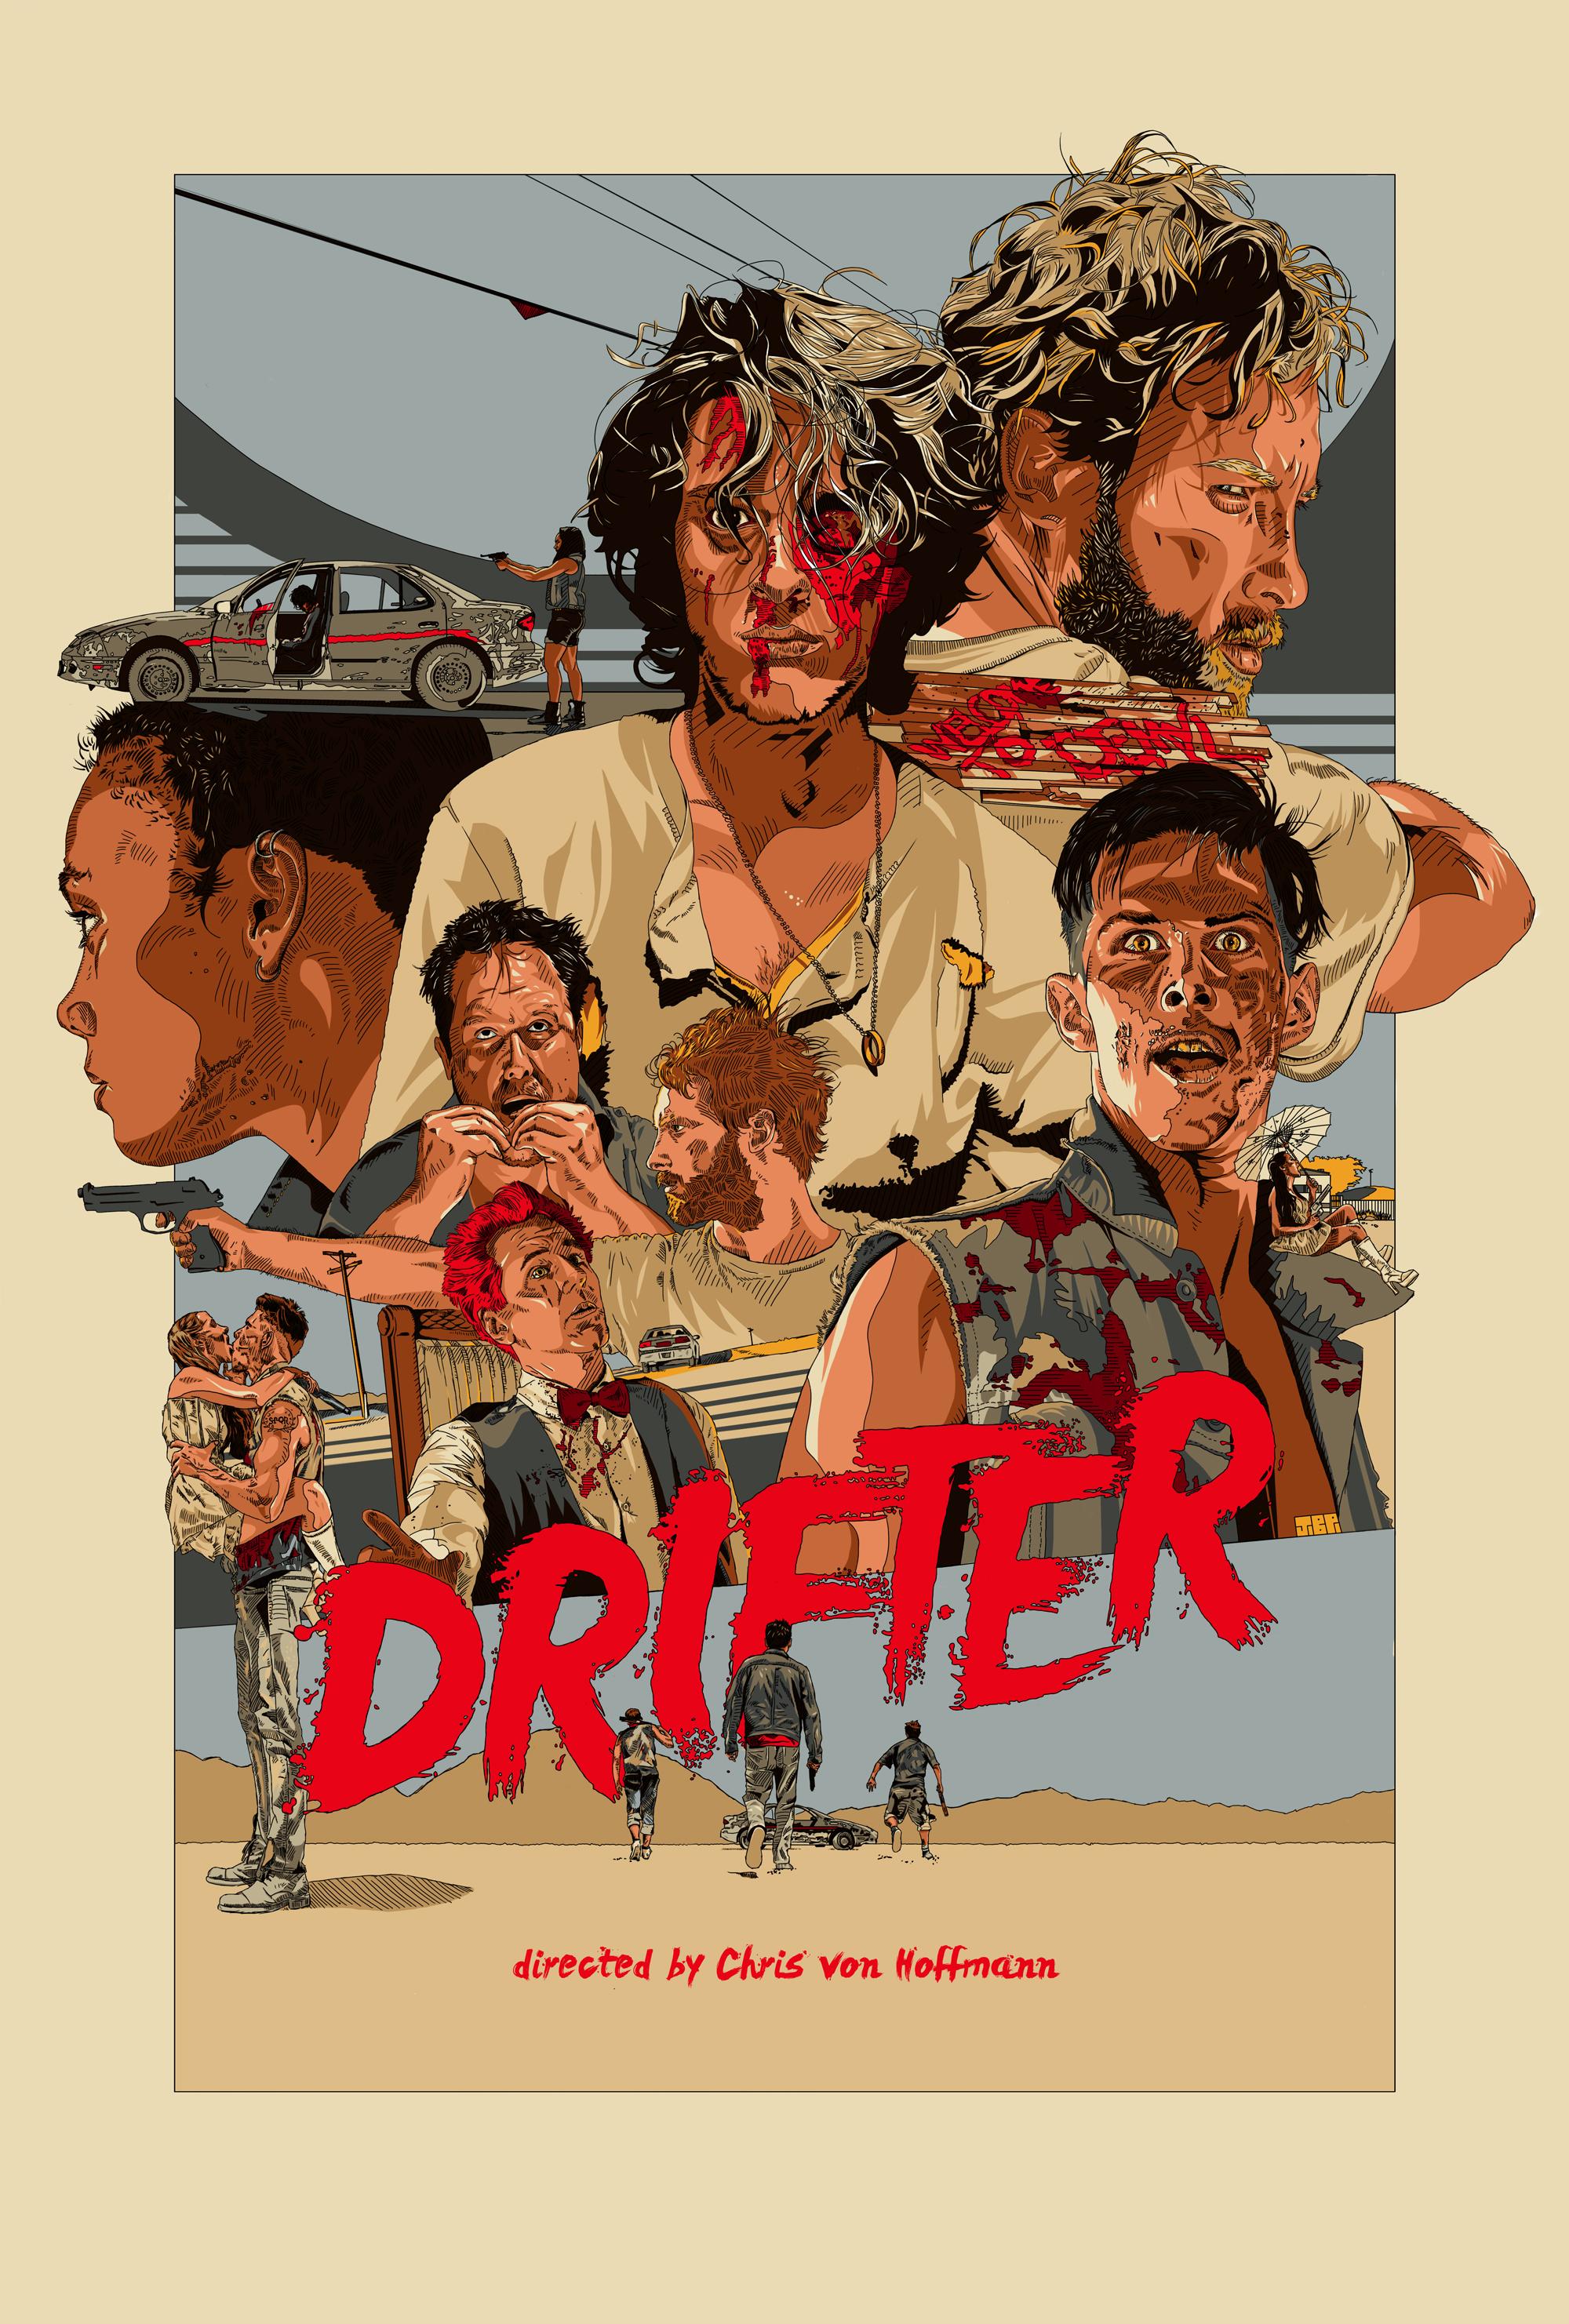 Drifter Official Movie Poster - Film and TV - Jonathan B Perez - cREAtive Castle Studios.jpg